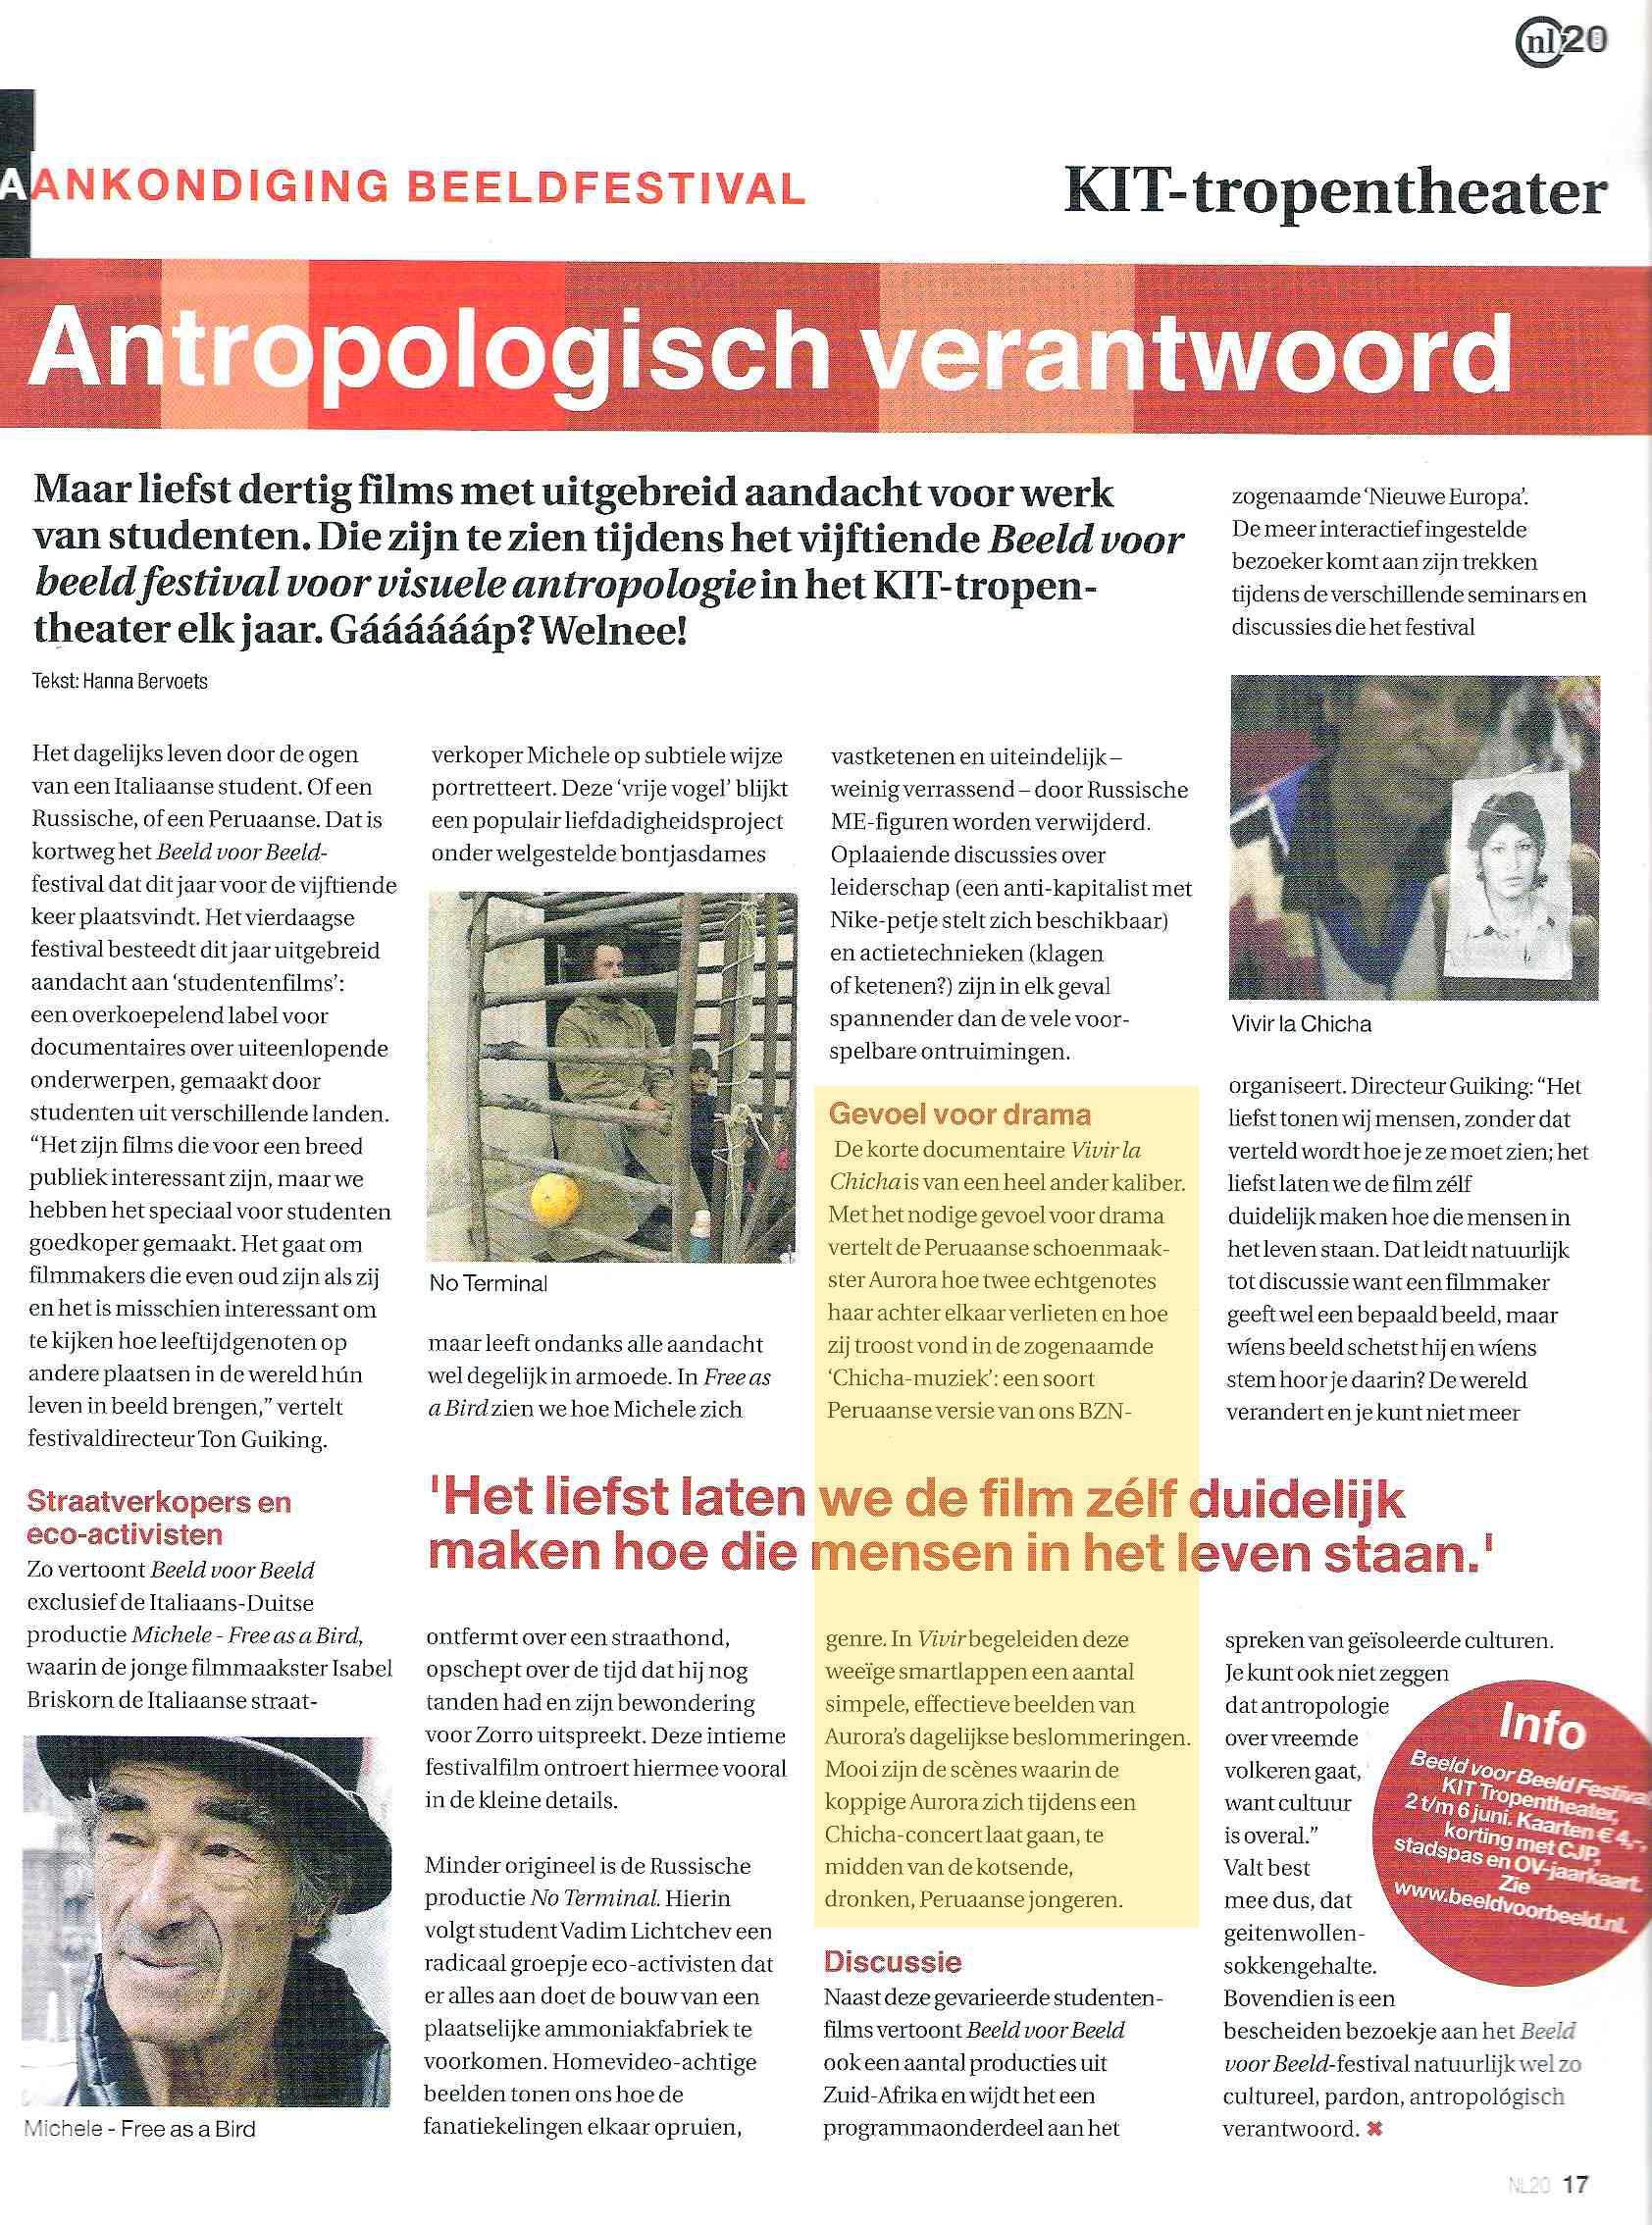 NL20_2004